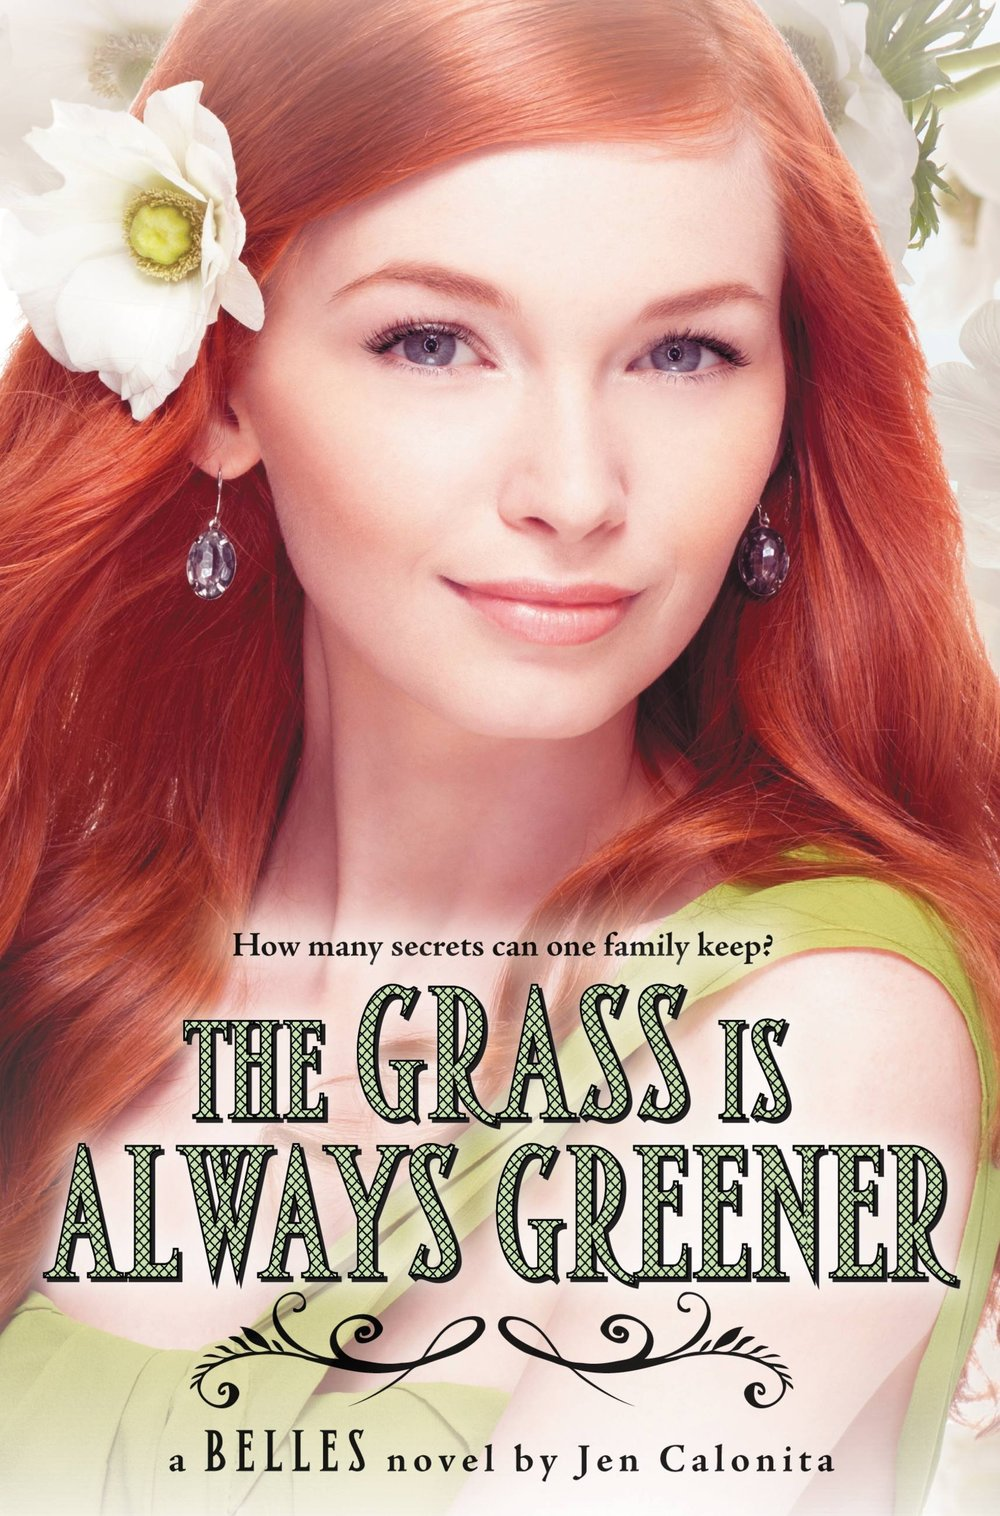 jen-calonita-grass-greener.jpg